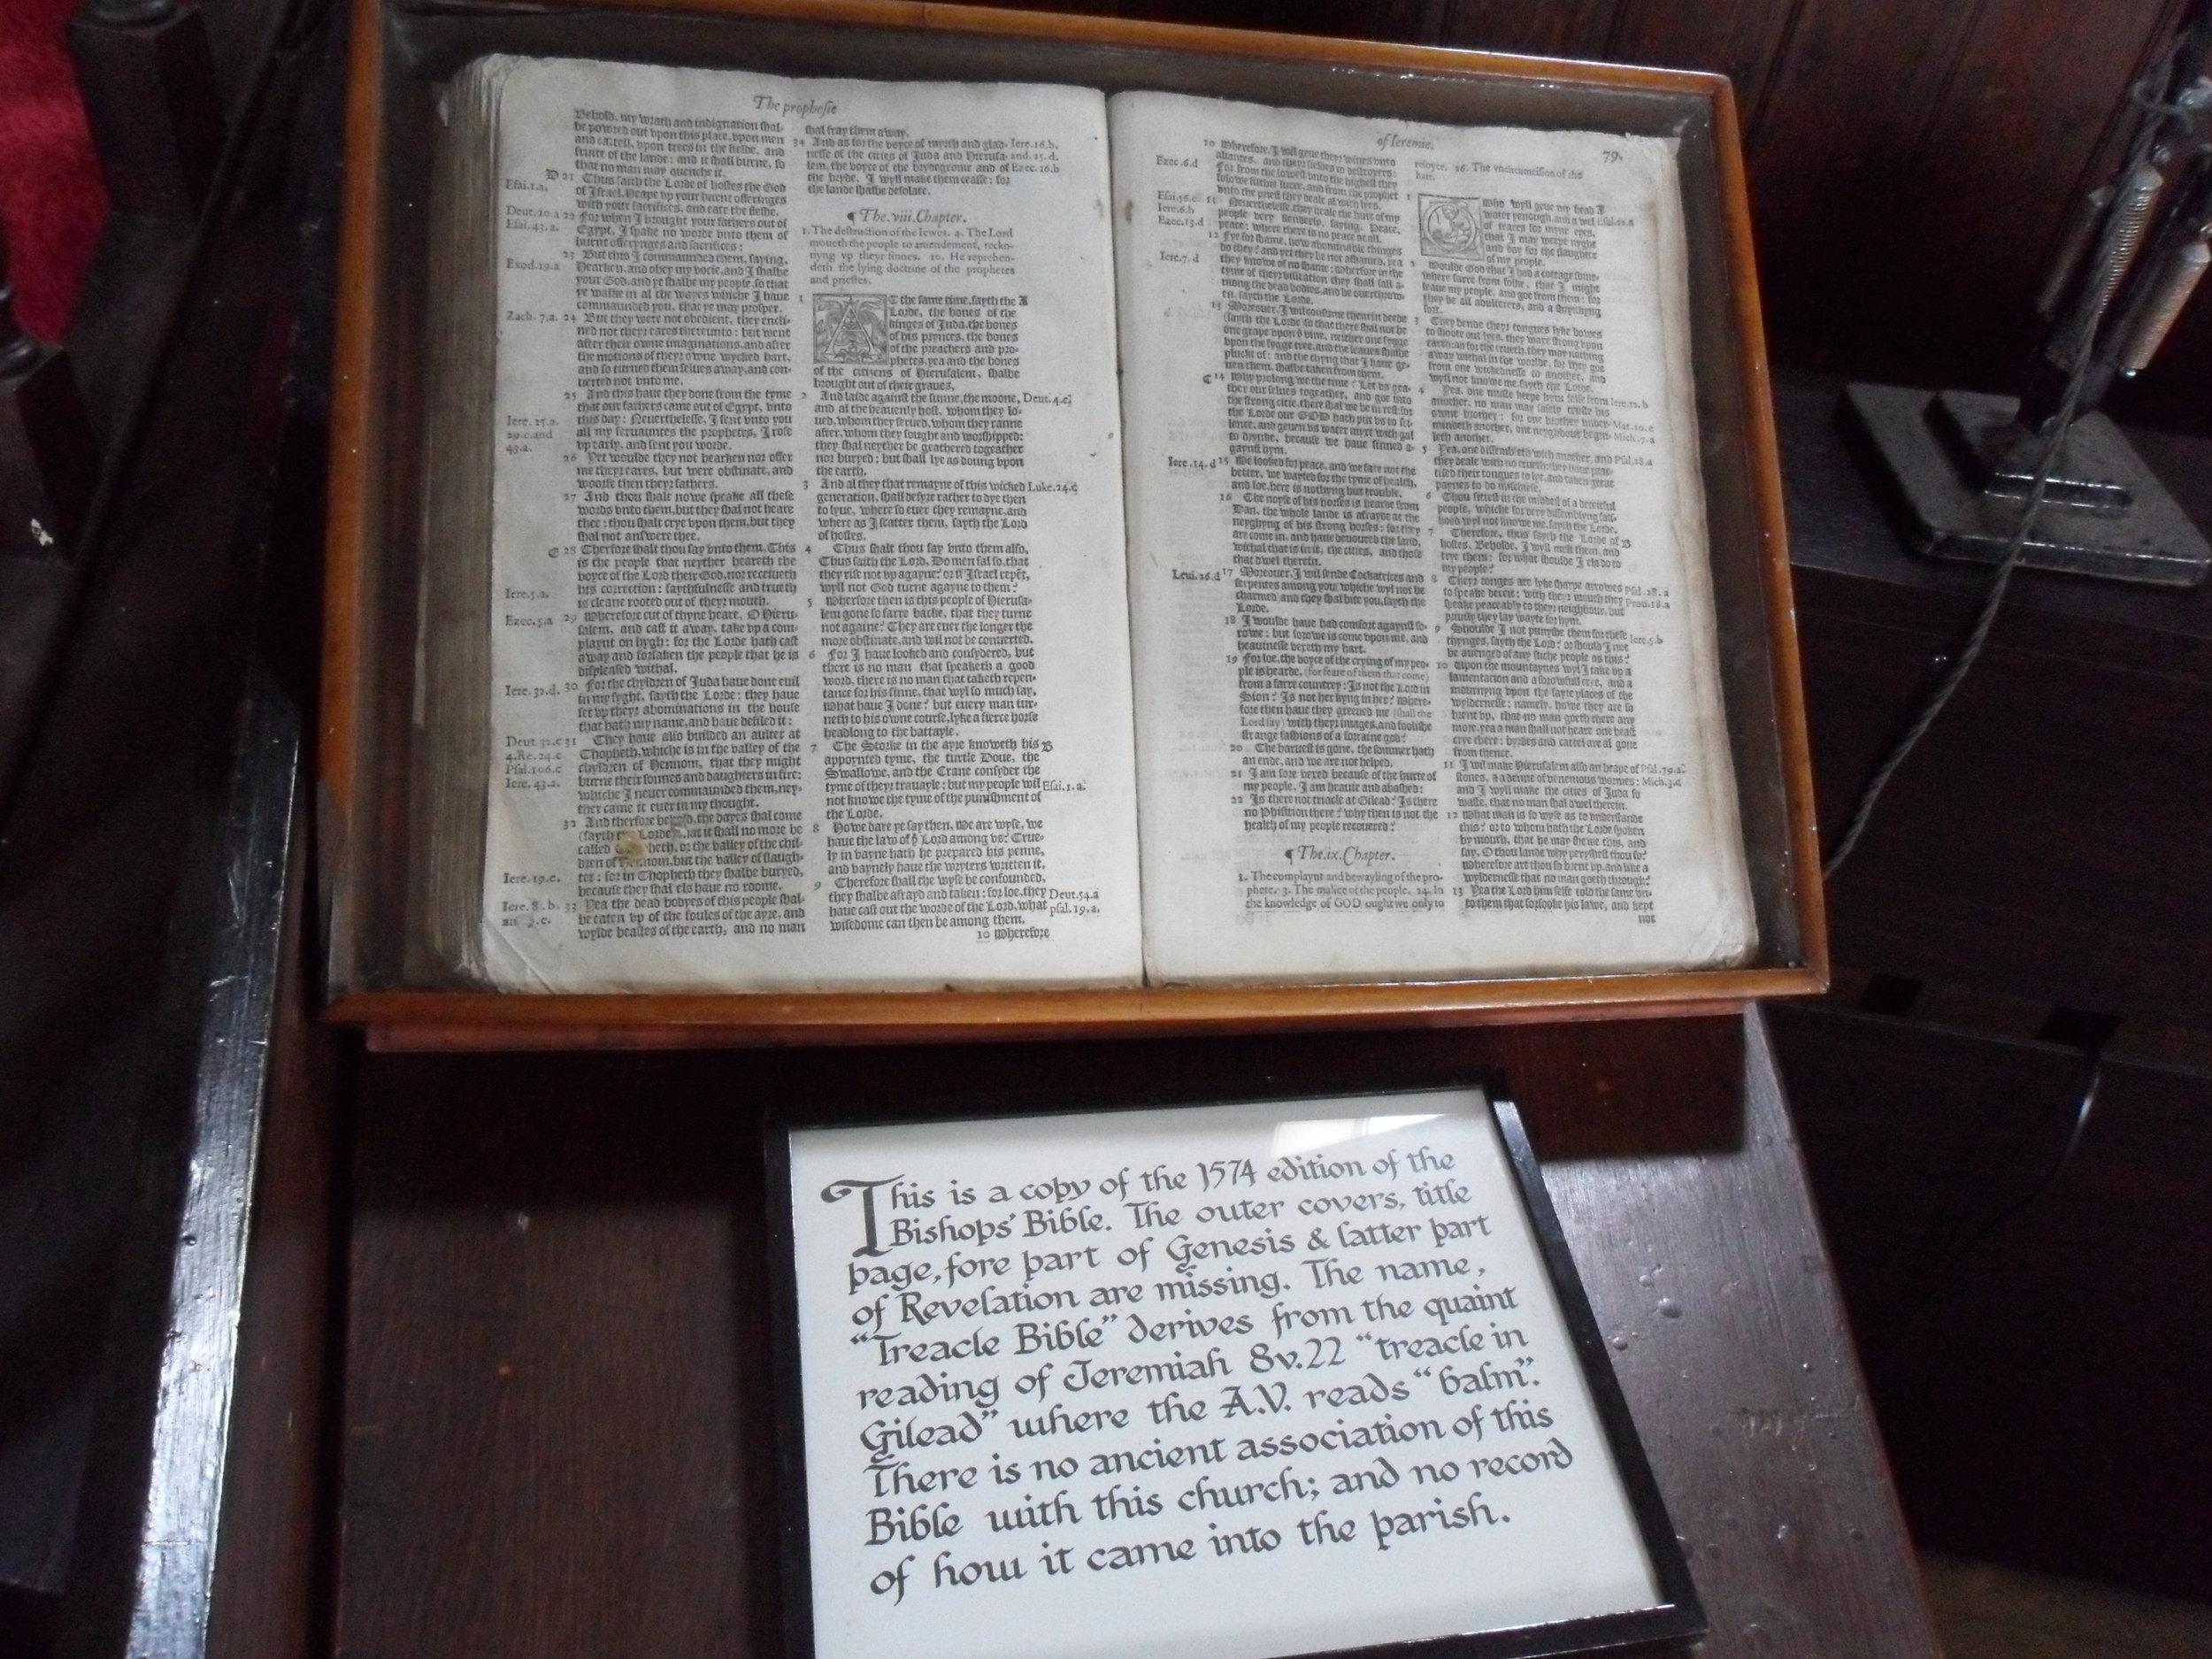 2013-7-17-9-kirkmaiden-church-treacle-bible-1574.jpg